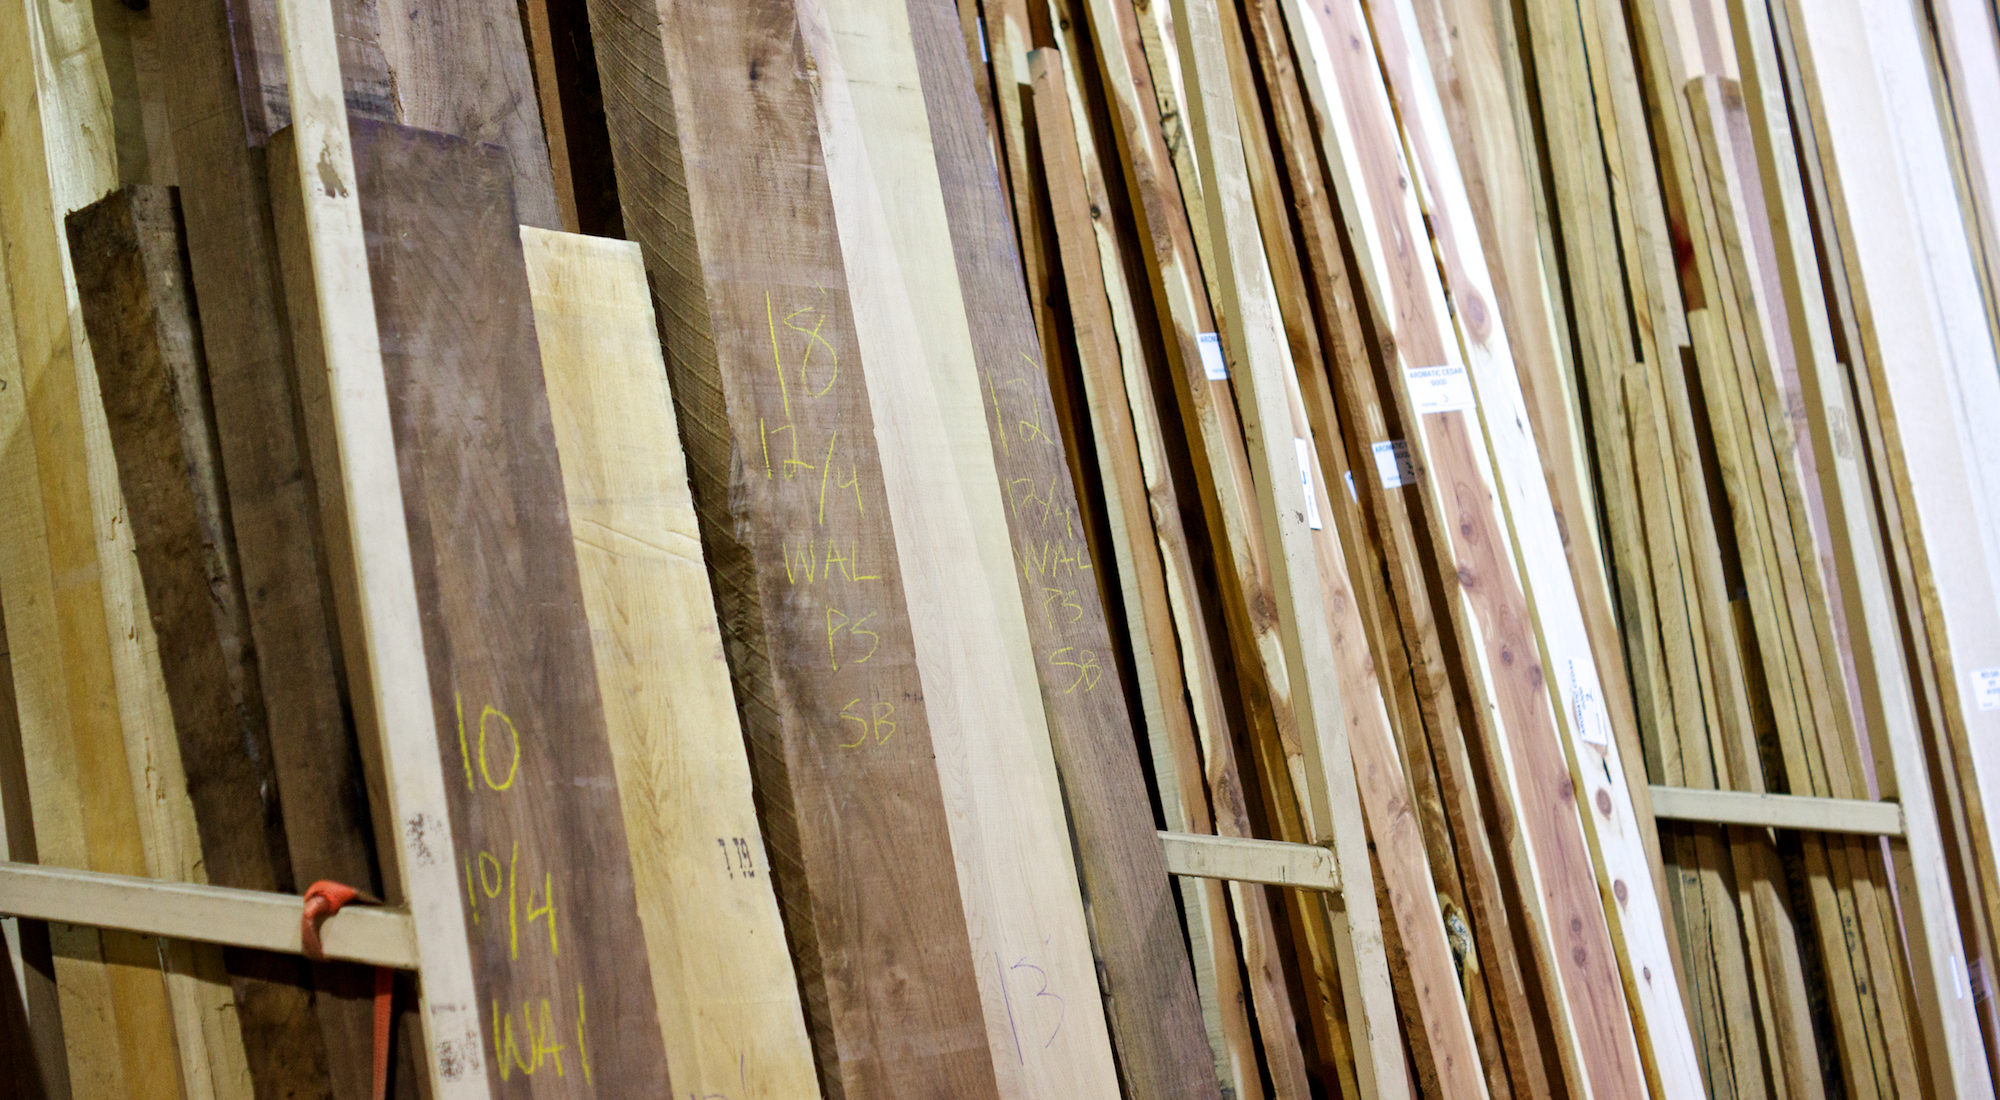 Frank Miller Lumber Retail Store stock